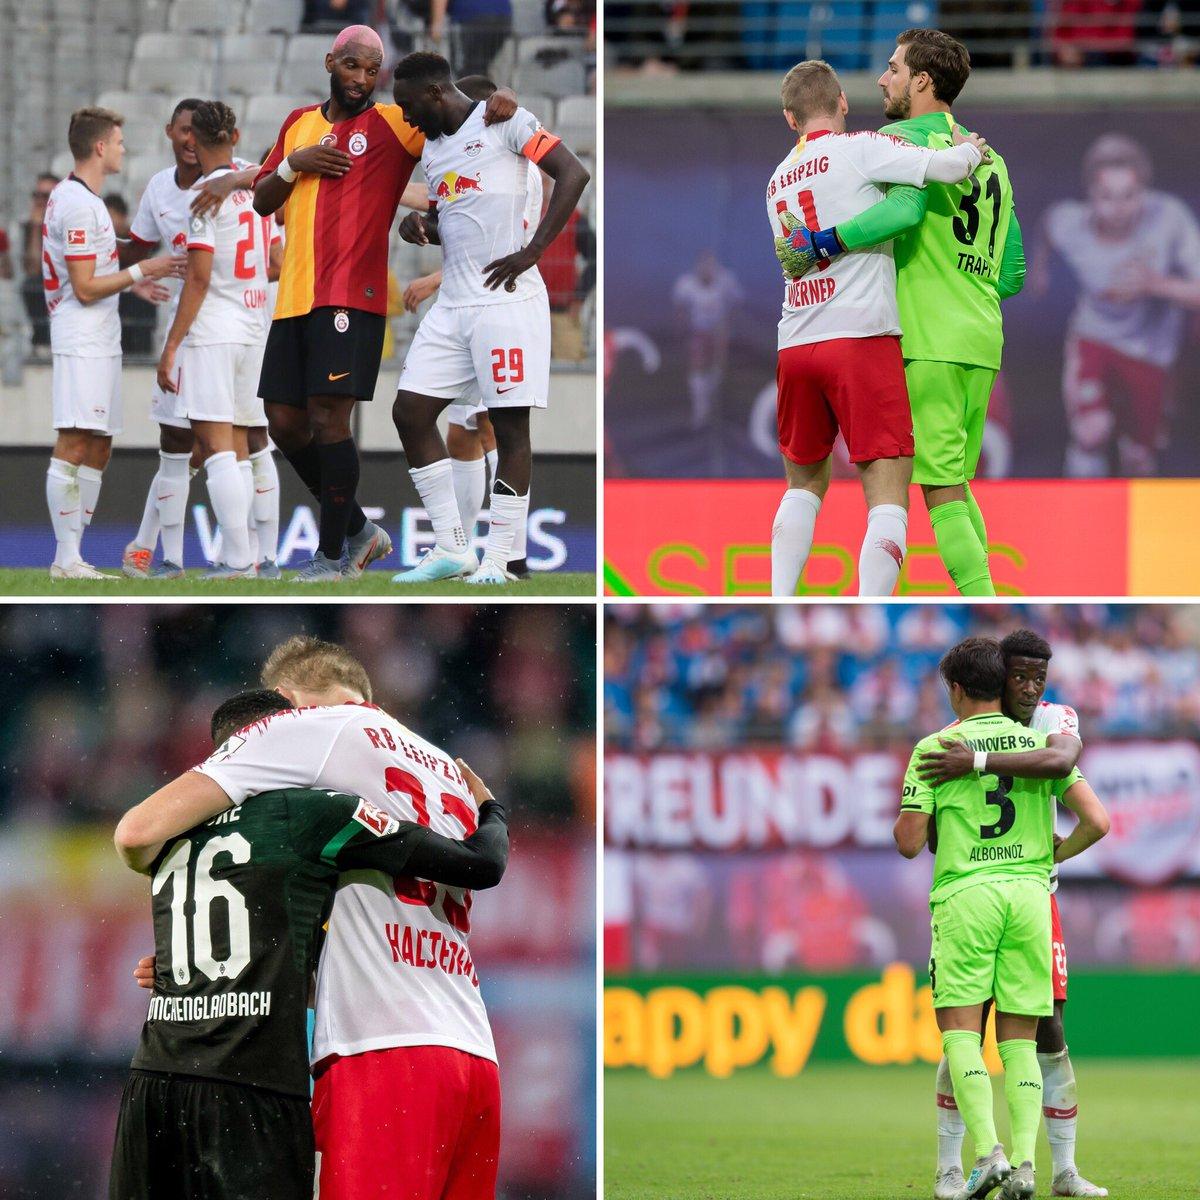 Rb Leipzig On Twitter Fussball Verbindet